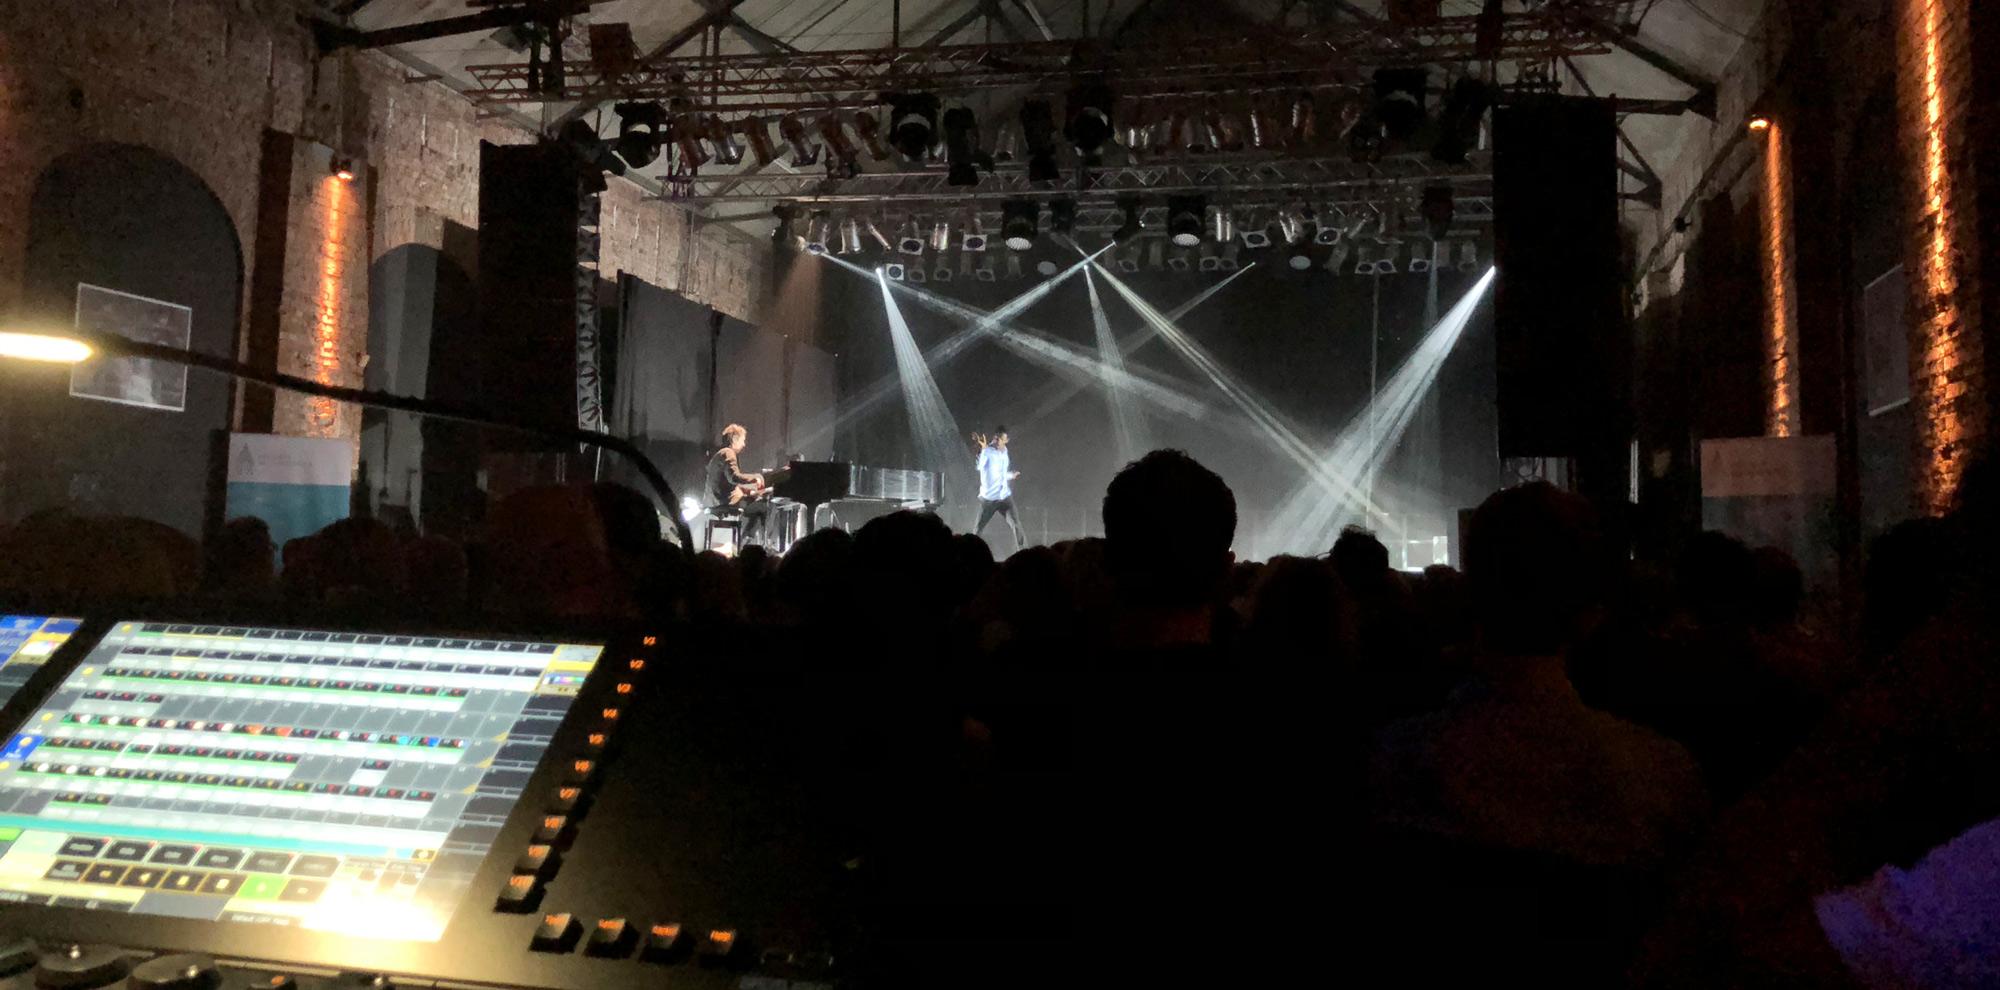 Dresdner-Musikfestspiele-Spotlight-Music-Veranstaltungstechnik